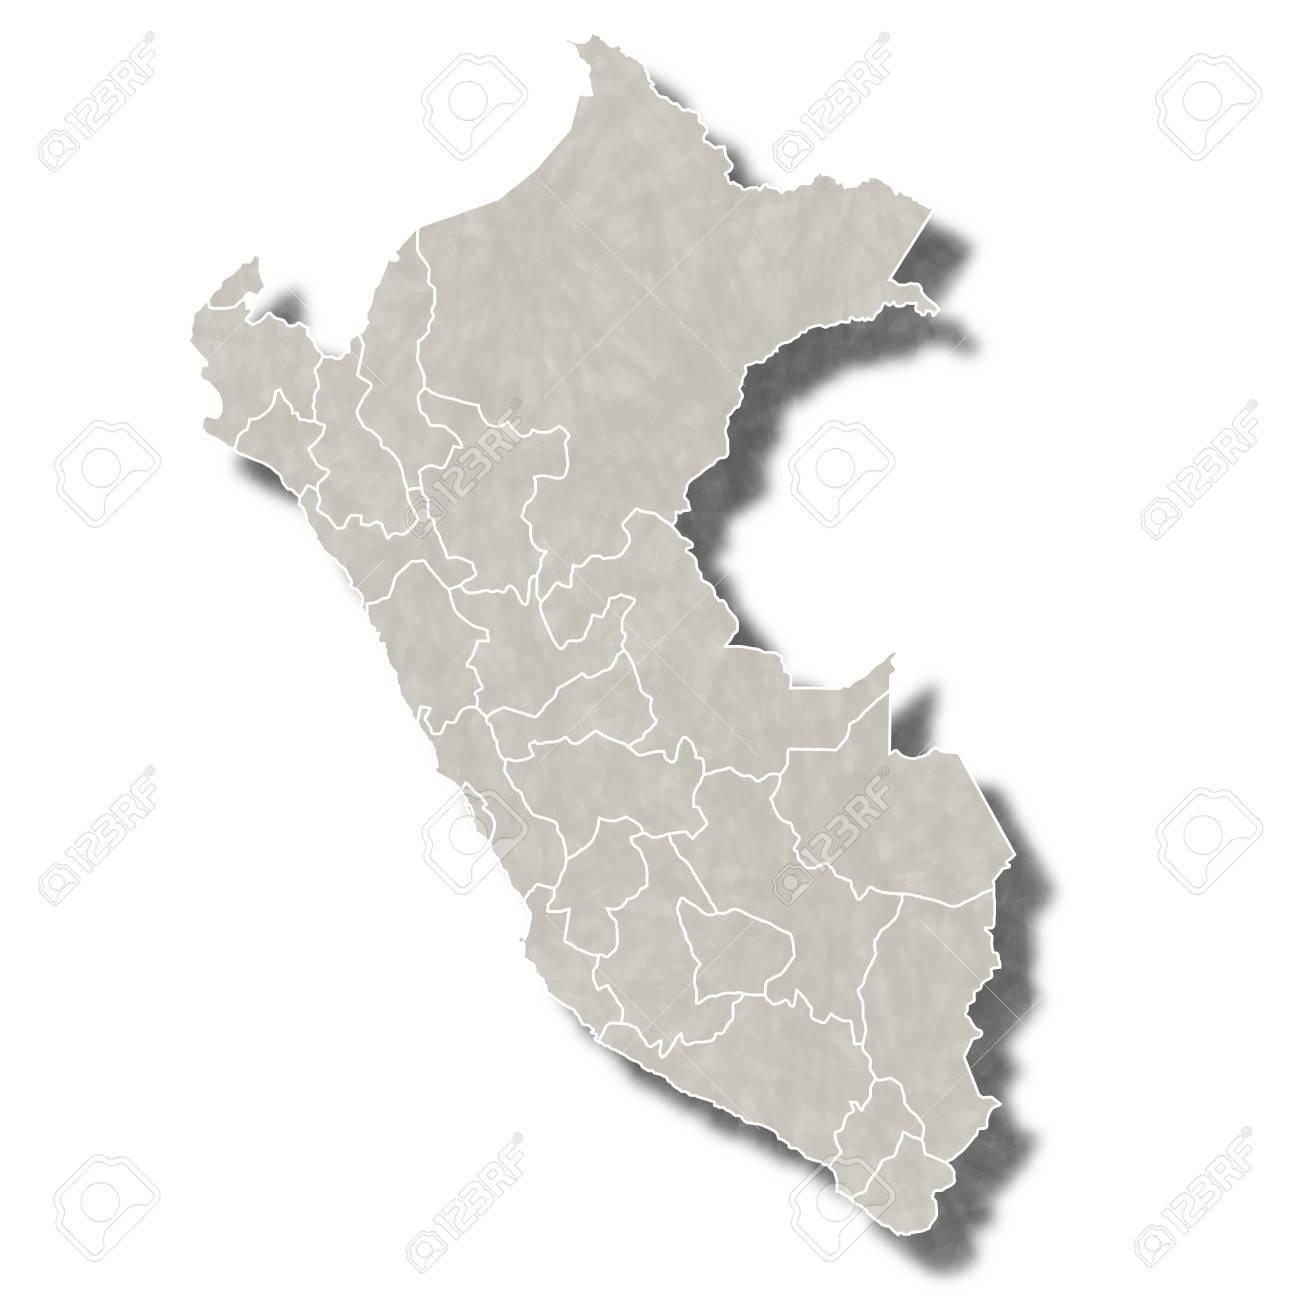 Peru map city icon City Map Of Peru on city map of western usa, city map of antigua, city map of latin america, city map of western europe, city map of shipshewana, city map of western united states, city map of bosnia and herzegovina, city map of hancock, city map of holland, city map of the carolinas, city map of south bend, city map of aruba, city map of eastern europe, city map of the netherlands, city map of united states of america, city map of northern italy, city map of bahrain, city map of luxembourg, city map of zionsville, city map of myanmar,